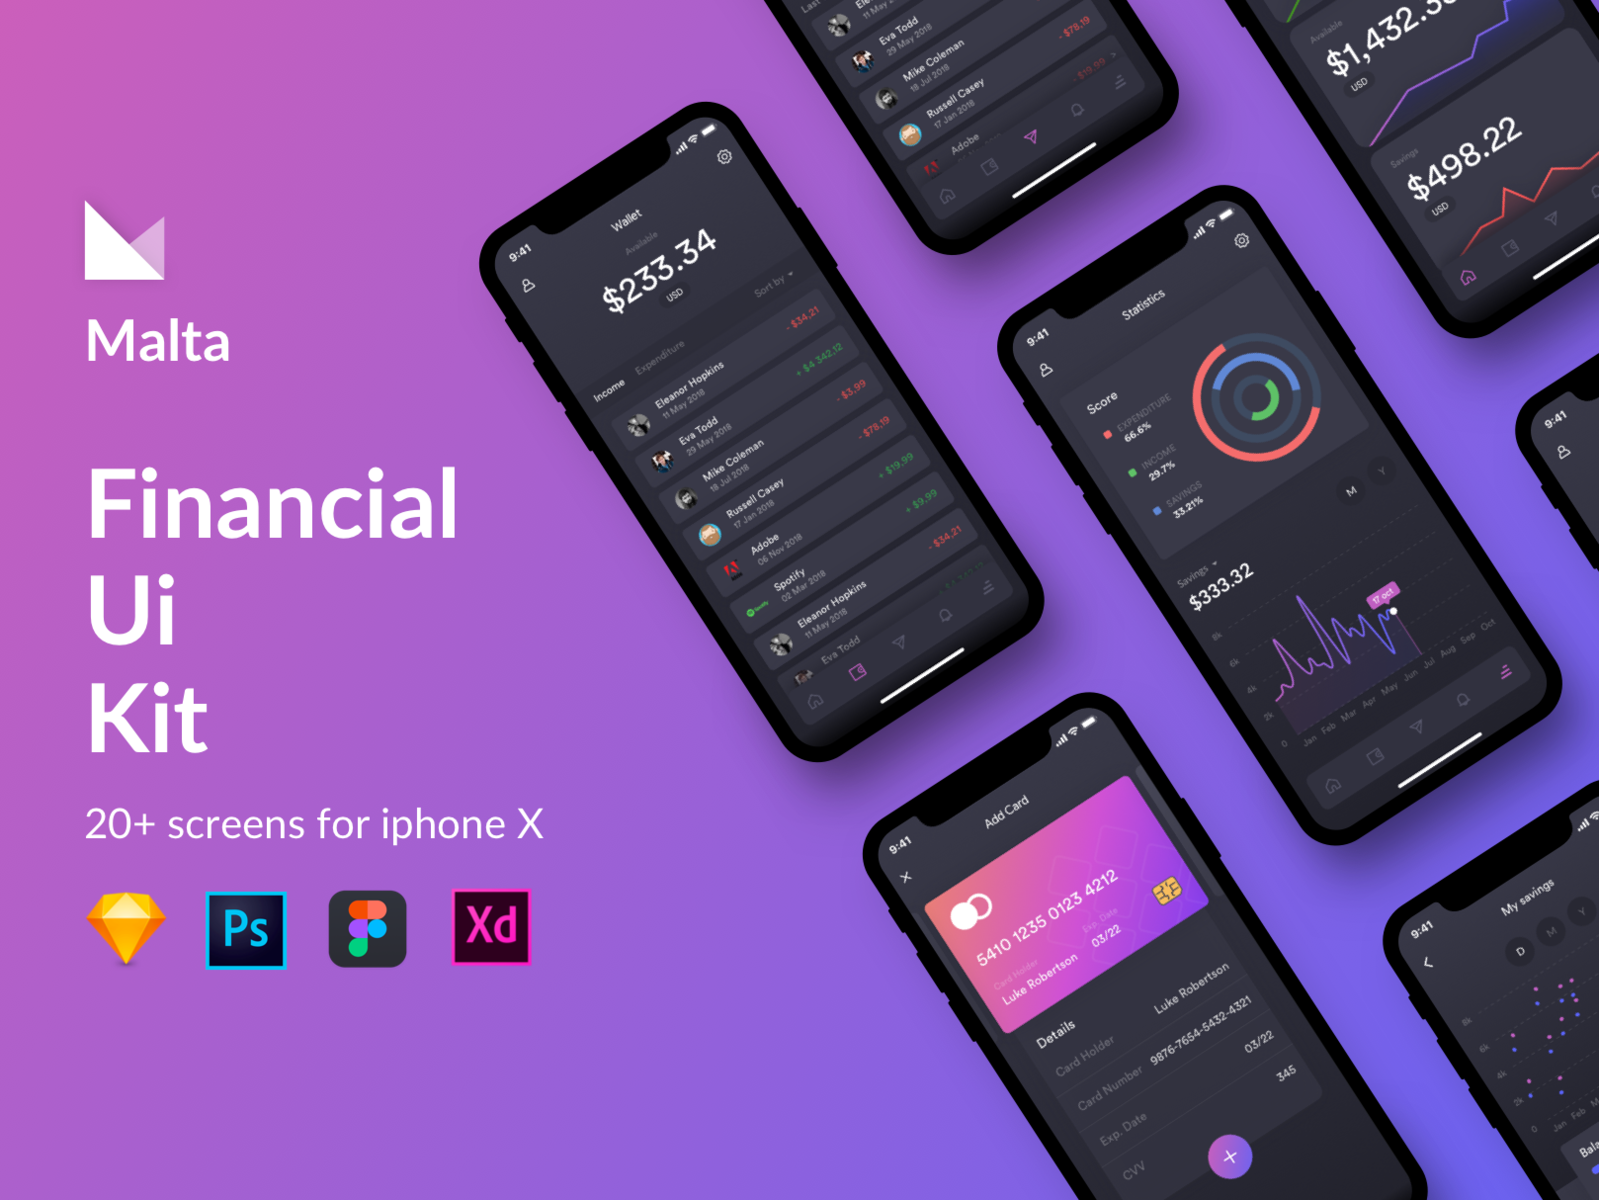 Malta Financial IOS app UI Kit